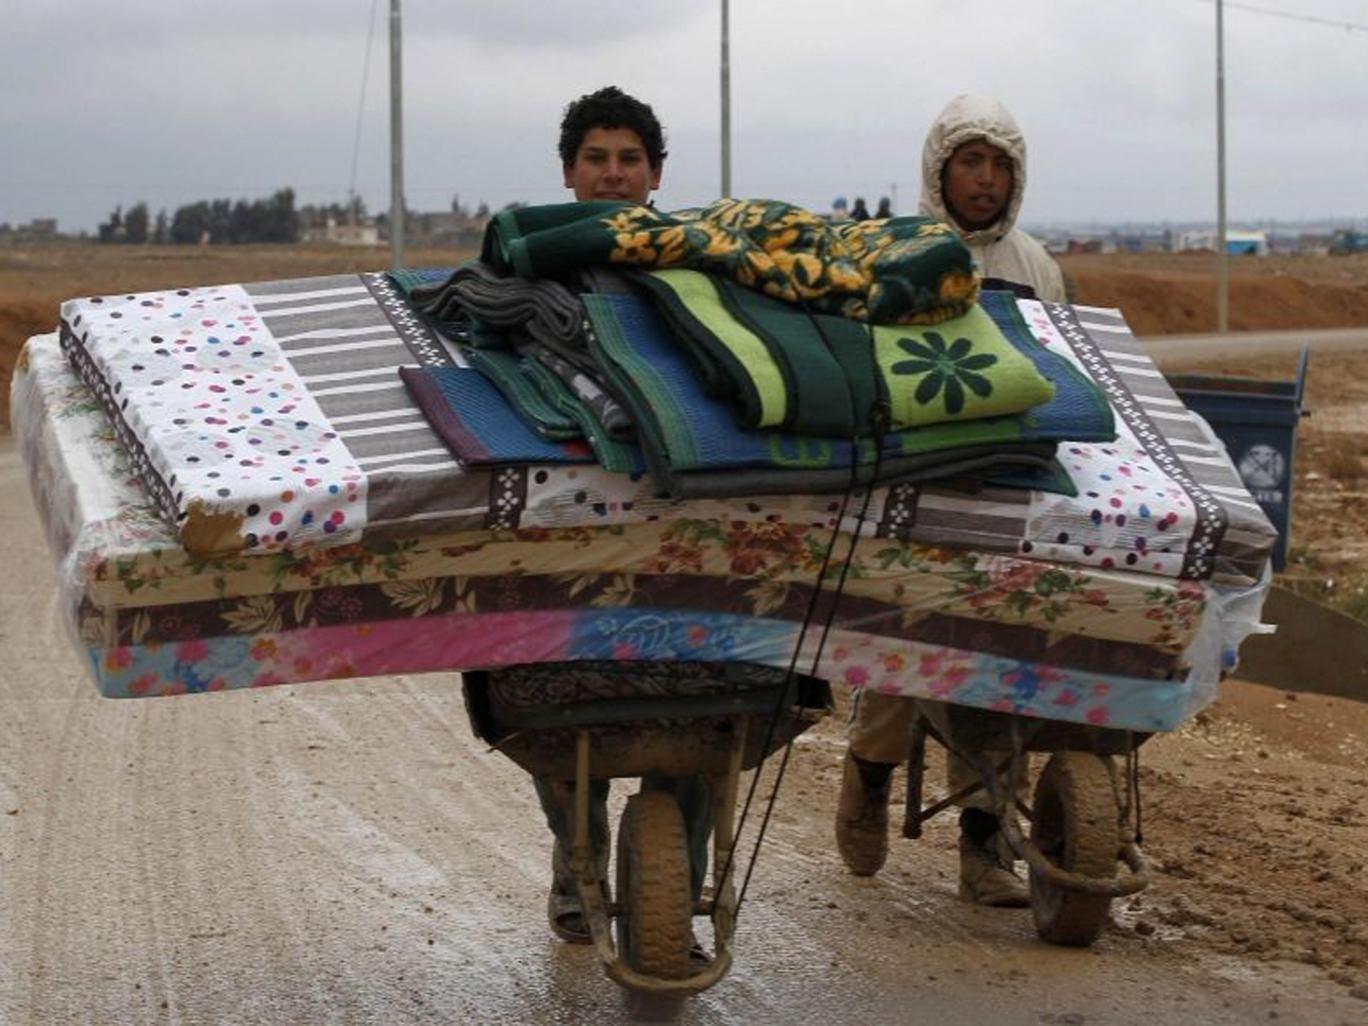 Syrian refugees at the Al Zaatari refugee camp in Jordan